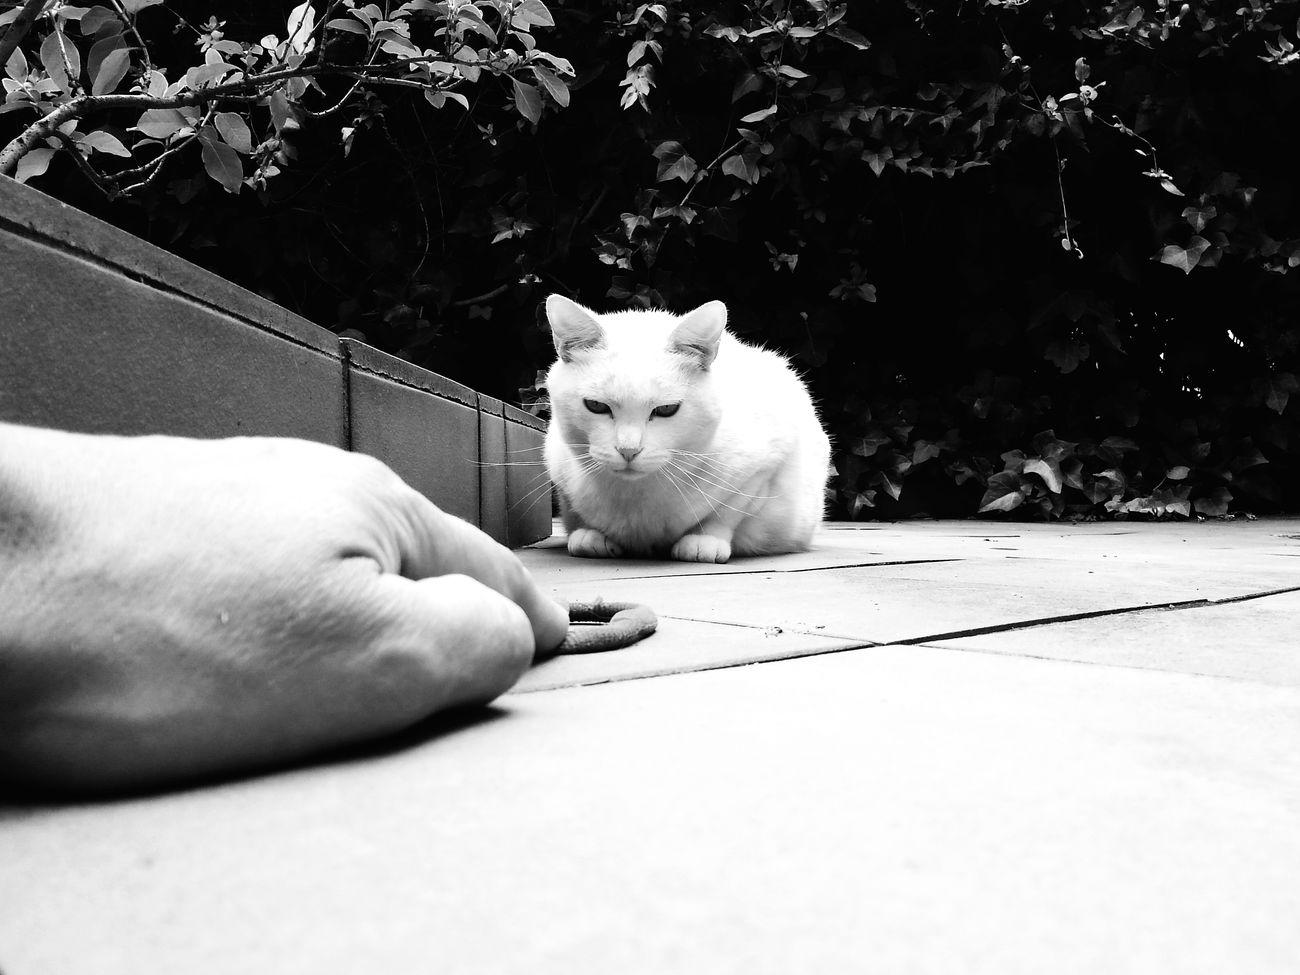 Gato Cat Blackandwhite Blancoynegro